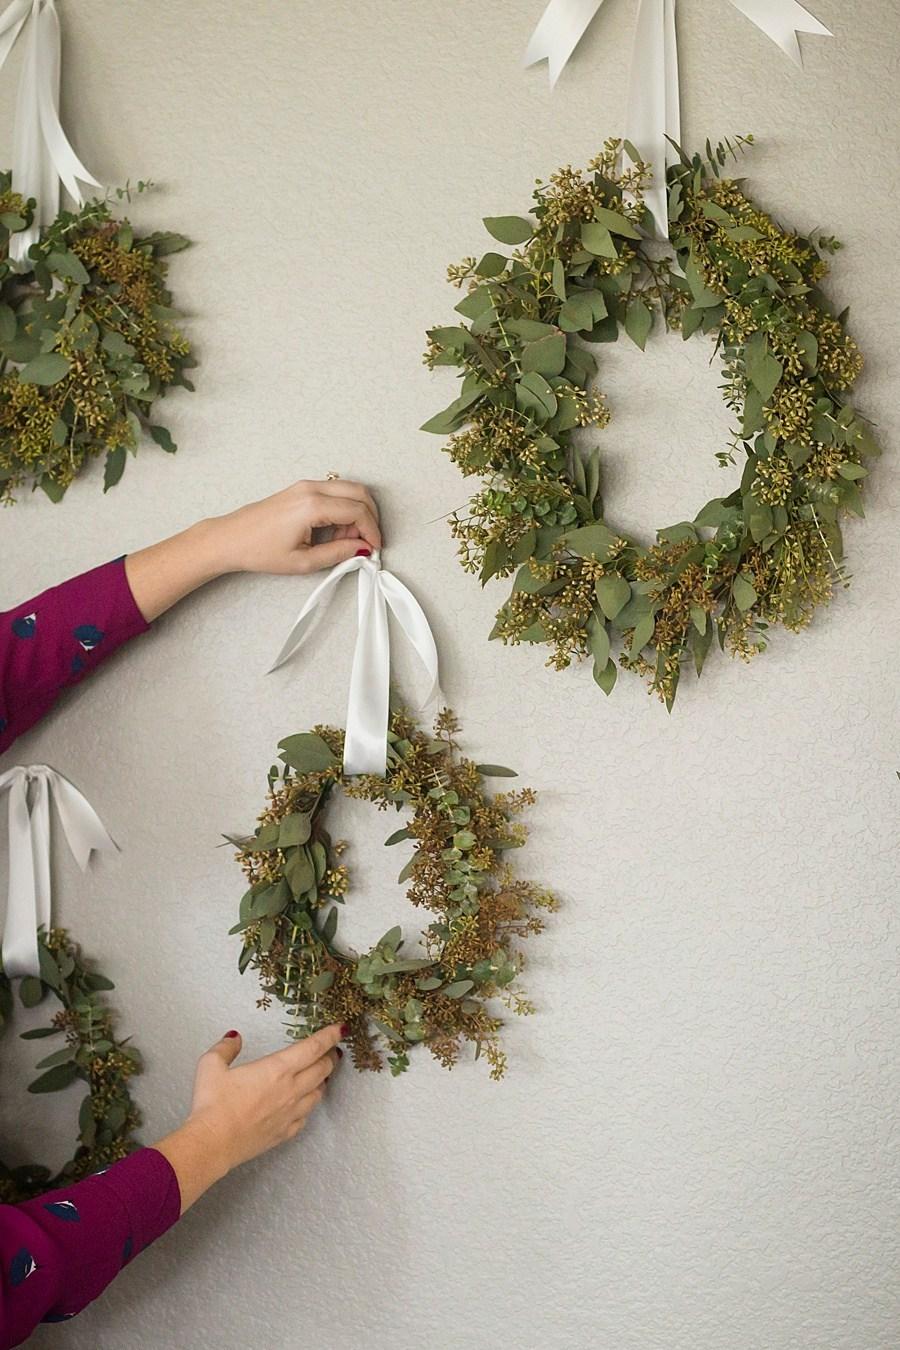 Hurried-Hostess-Christmas-recipe-entertaining-decor-ideas_0044.jpg